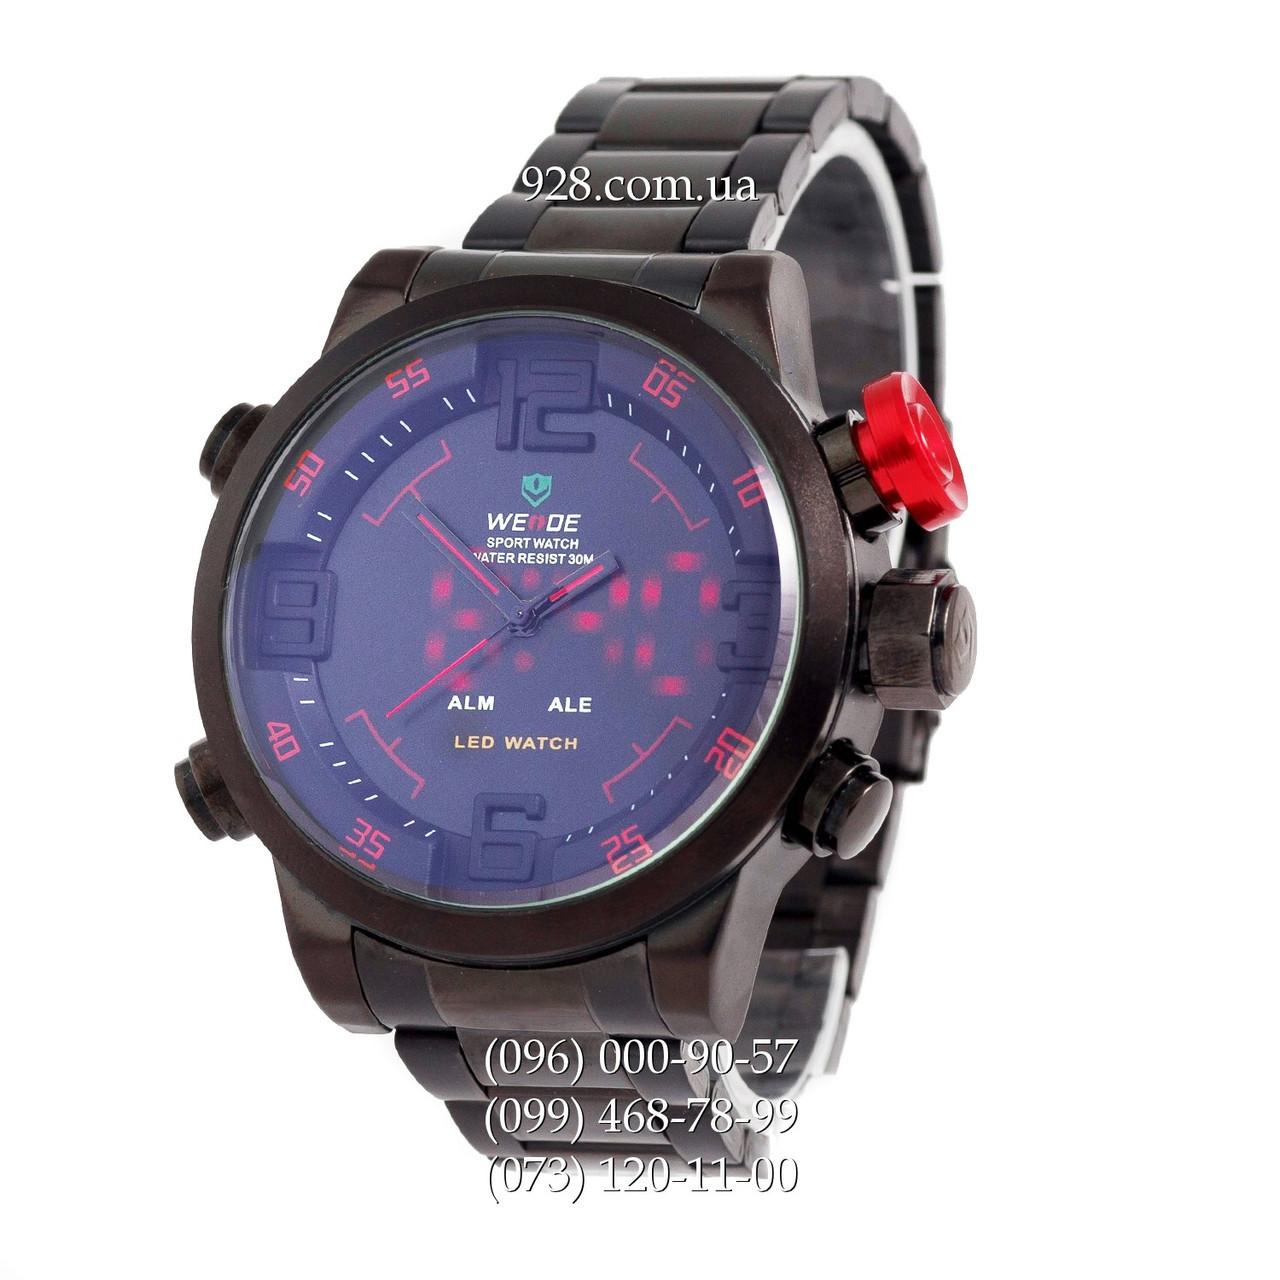 Классические мужские часы Weide Sport Black Red (кварцевые) - Интернет  Магазин